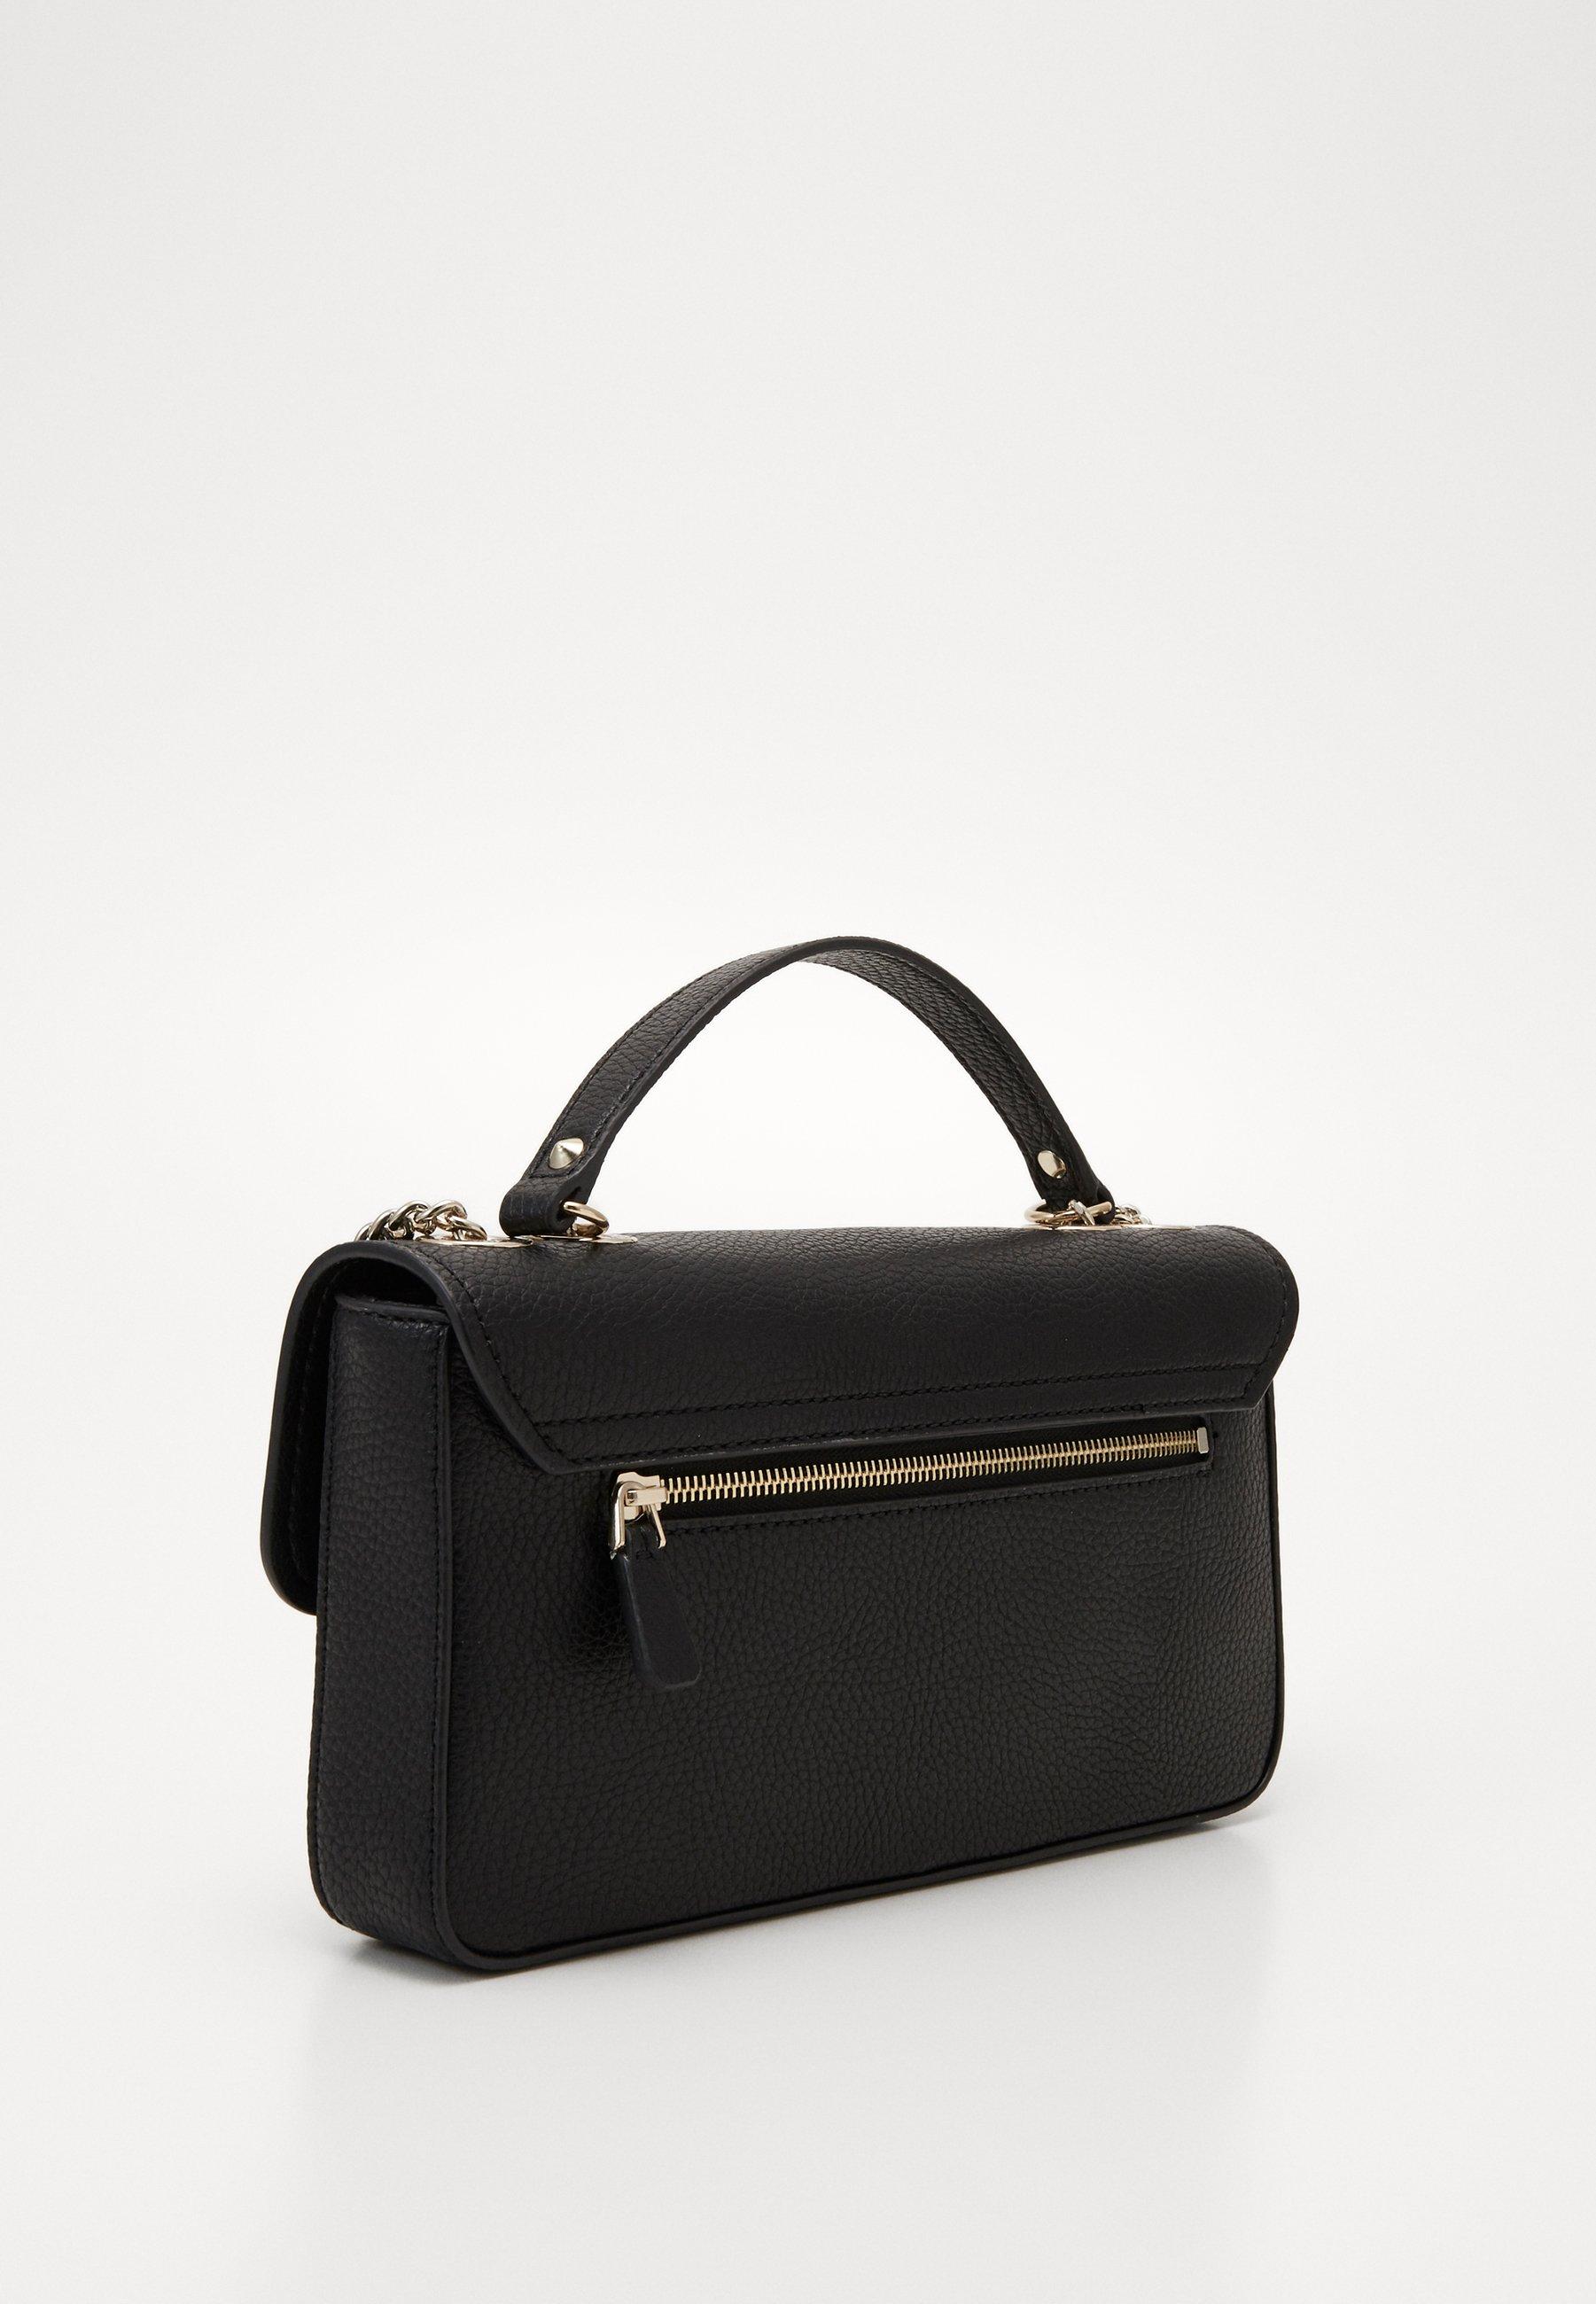 Damen BELLE ISLE XBODY FLAP - Handtasche